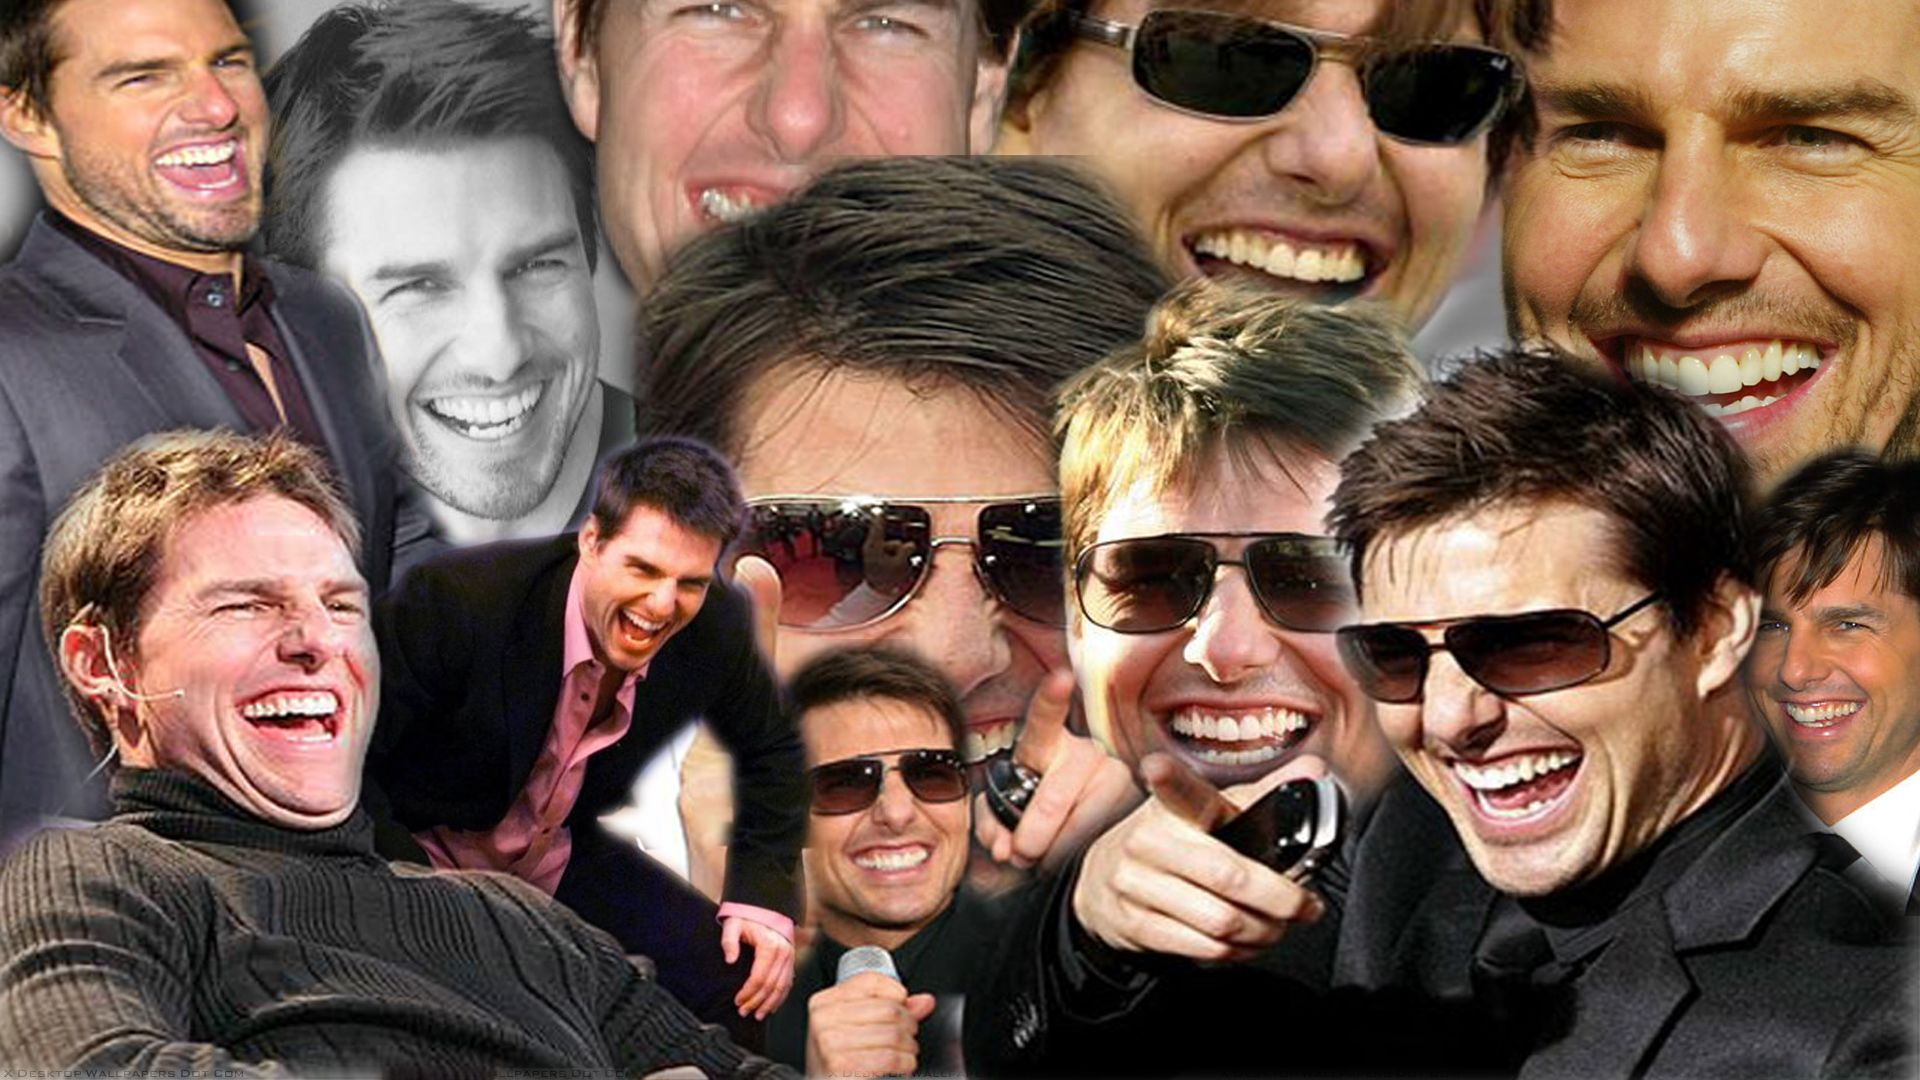 Tom Cruise Laughing HD Wallpaper 1920x1080 ID45629 Happy 1920x1080